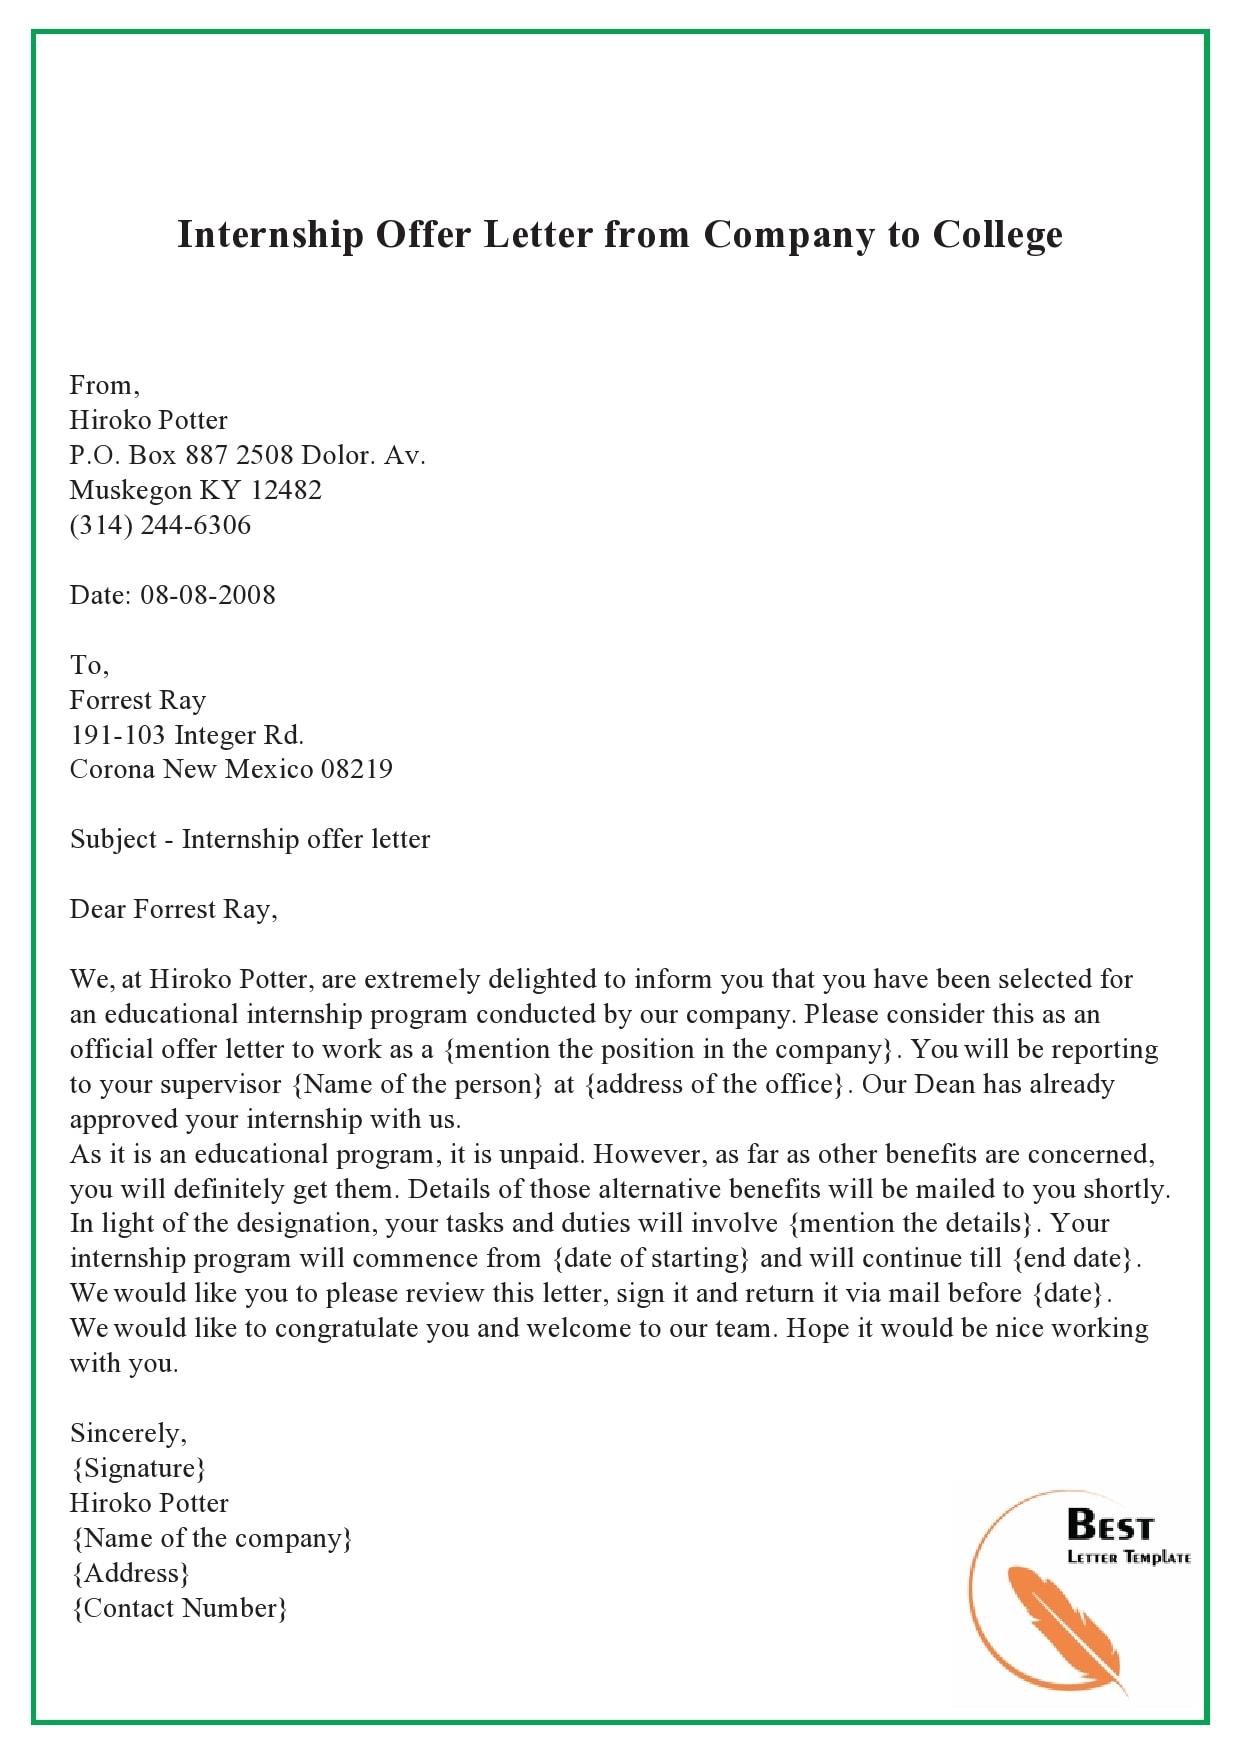 internship offer letter 23